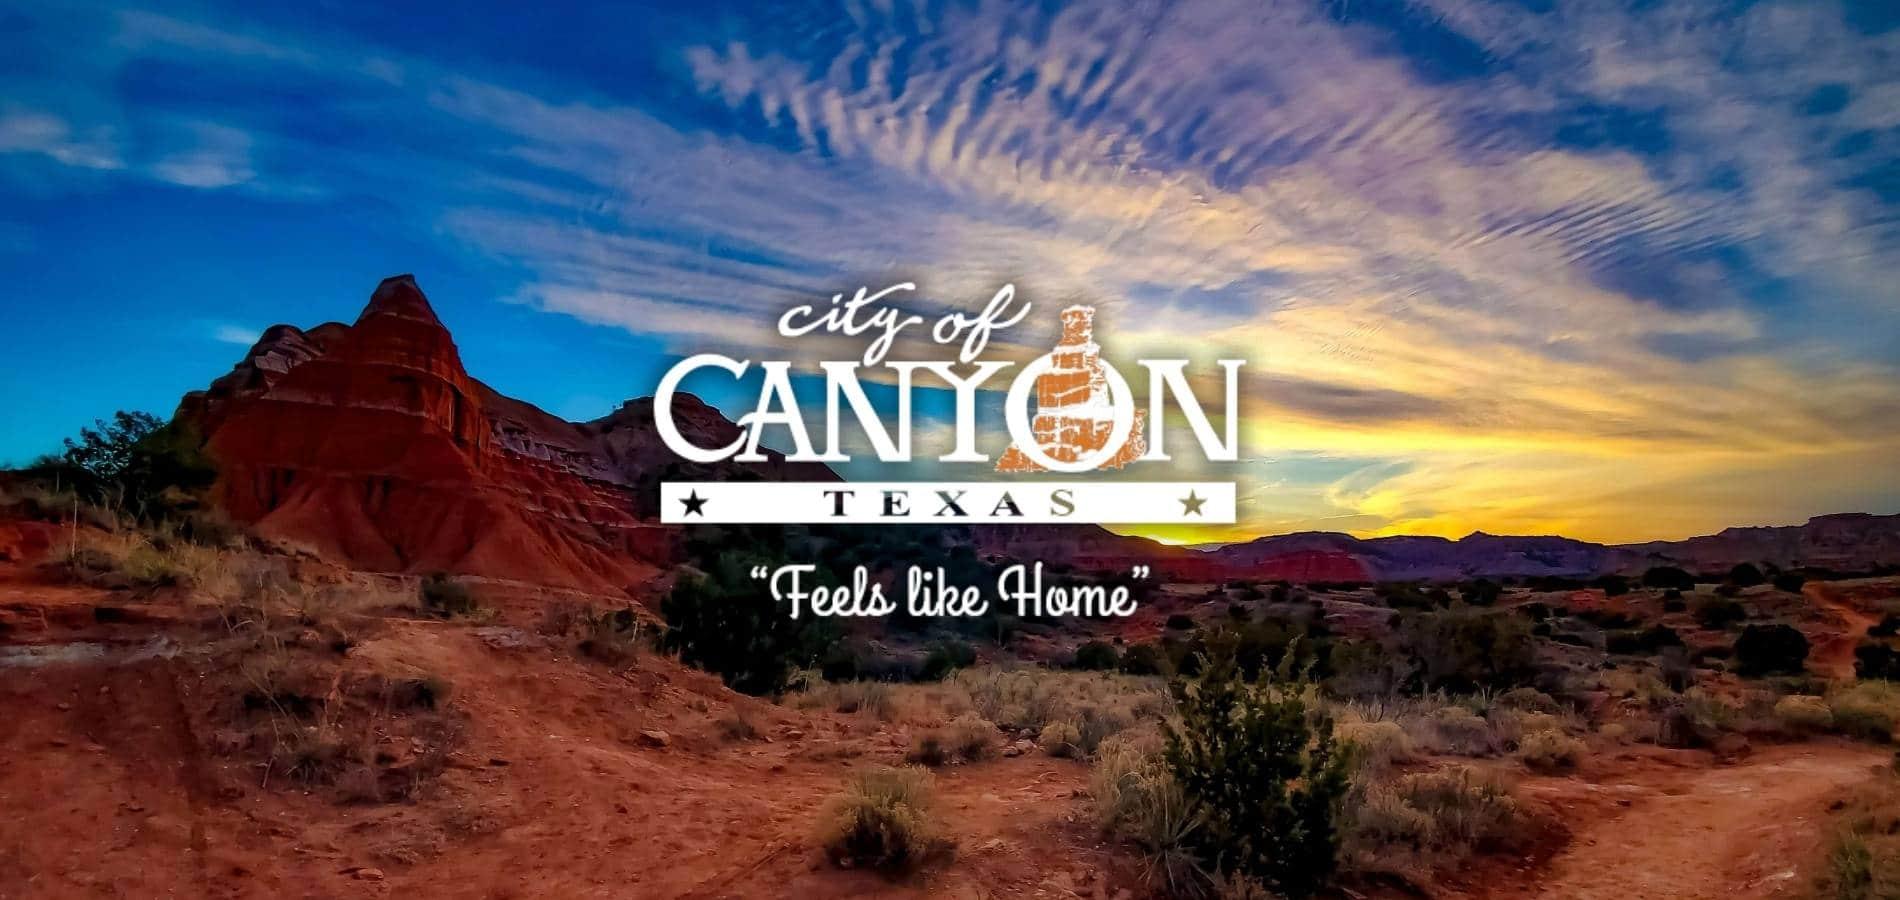 City of Canyon Texas